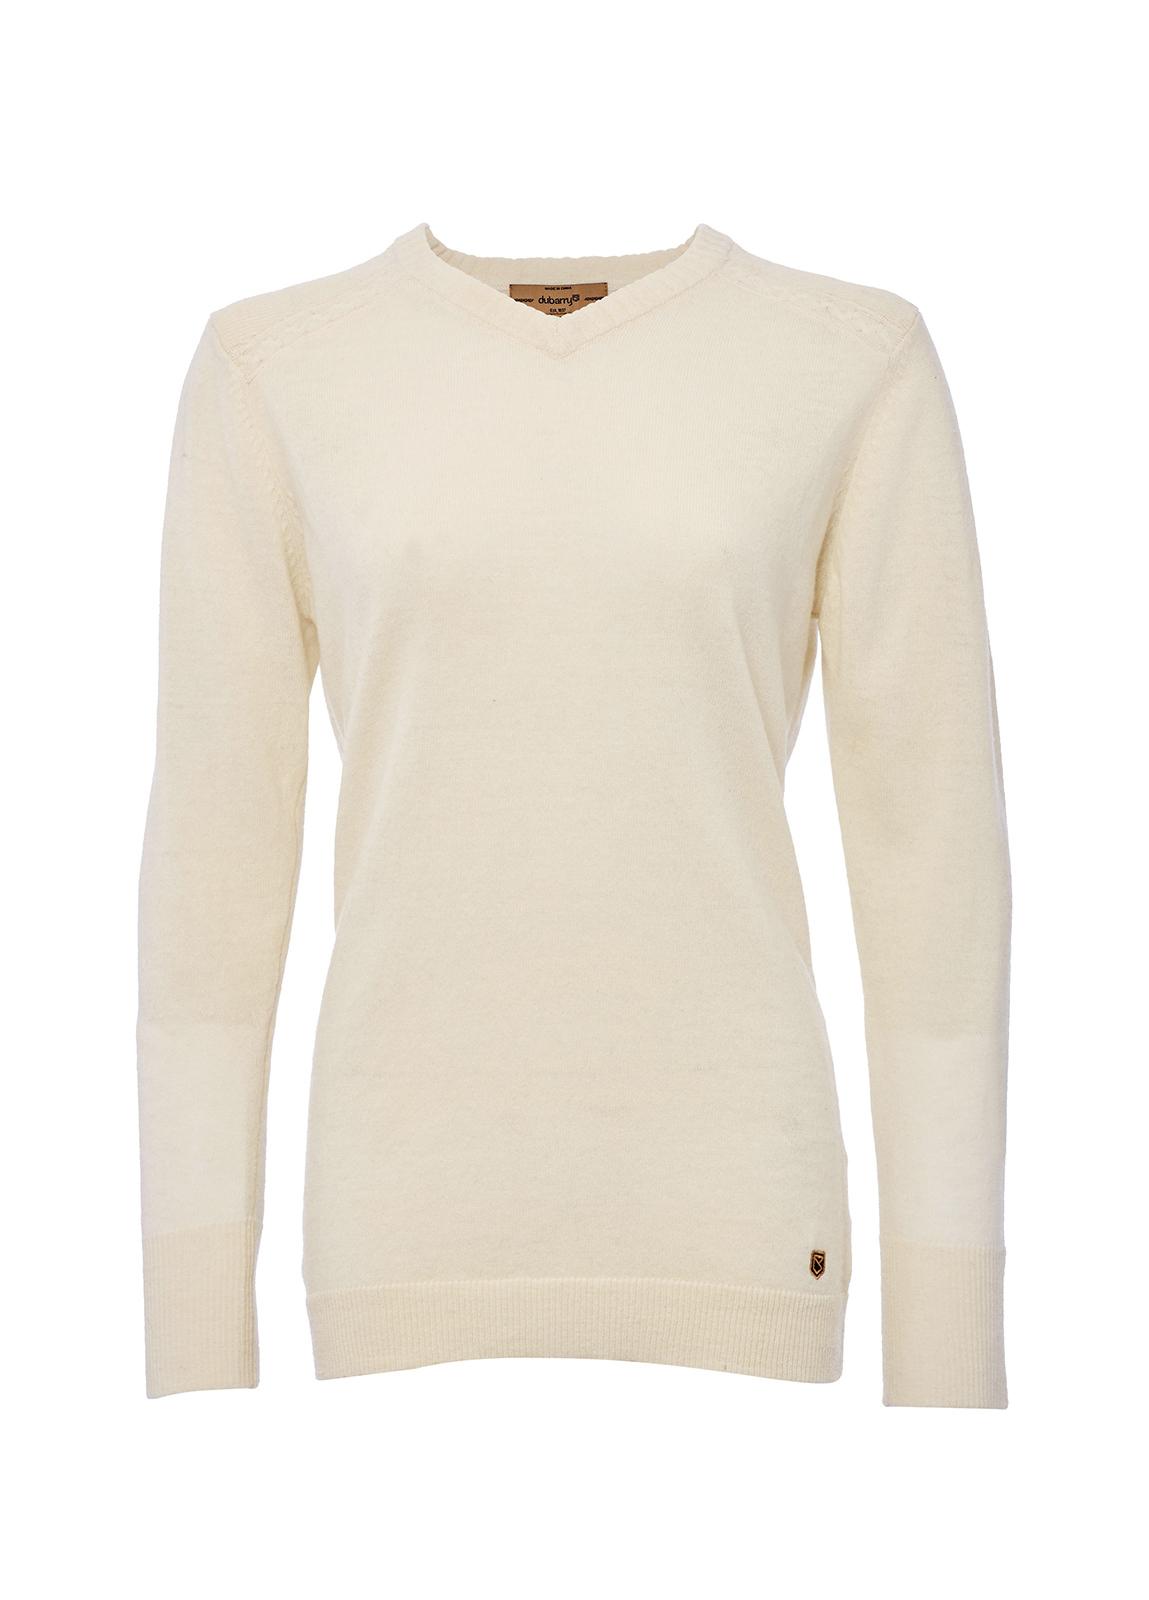 Dubarry_ Ballycastle Sweater - Ivory_Image_2